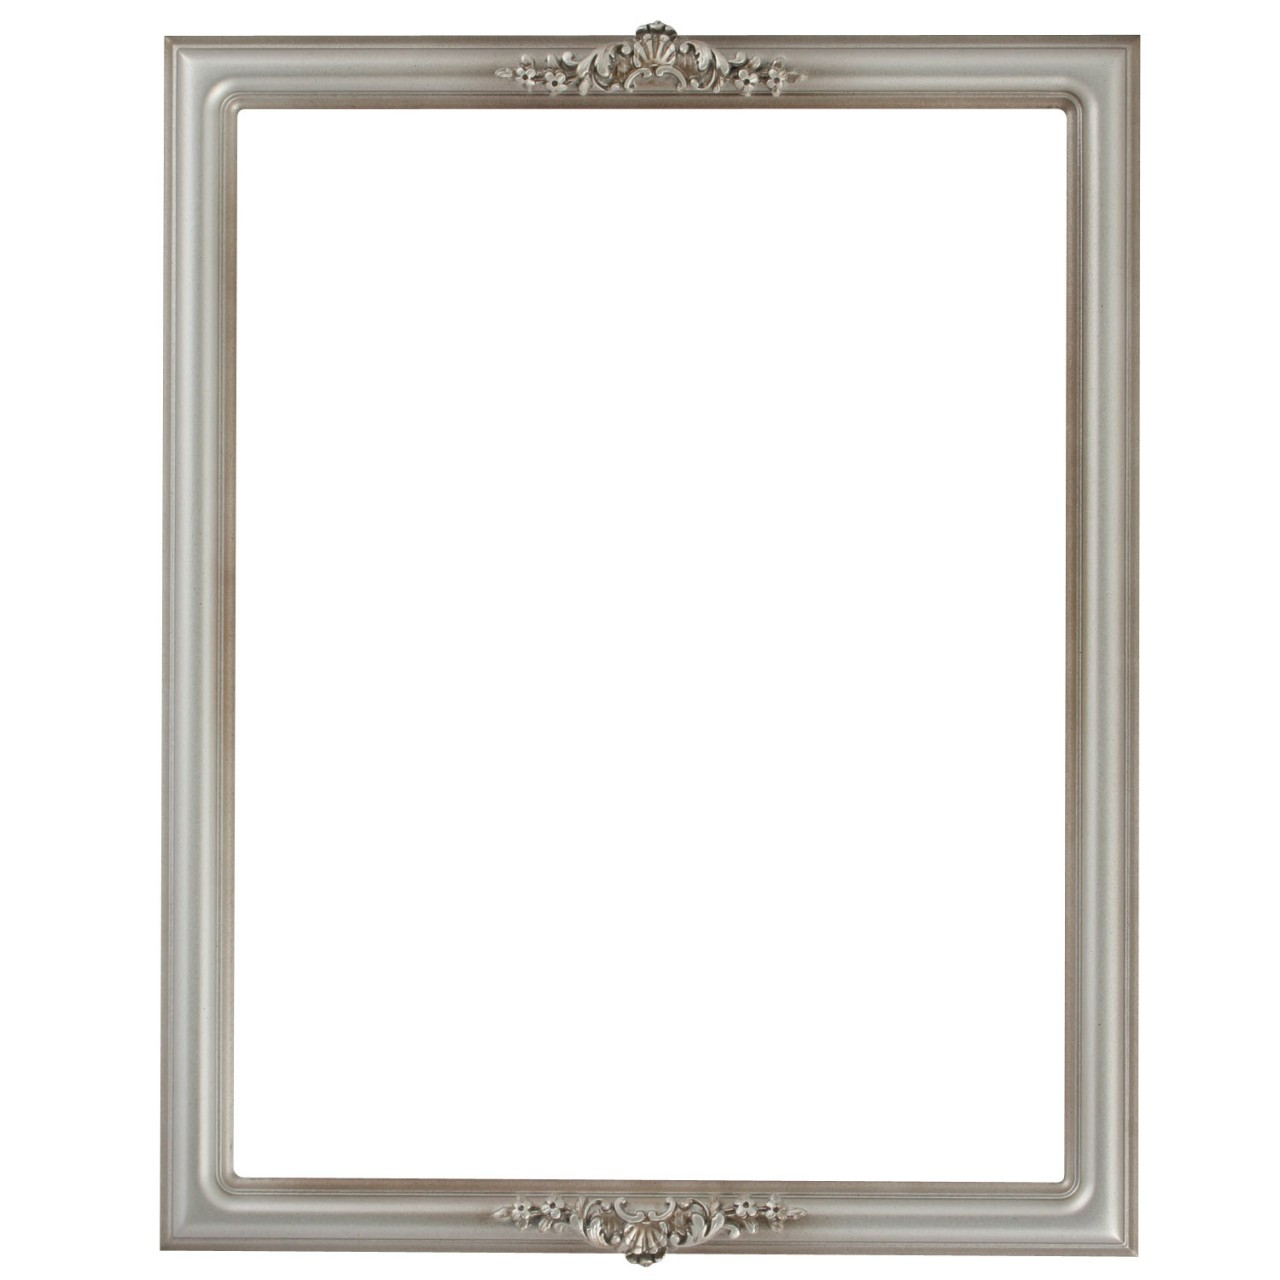 Rectangle Frame In Silver Shade Finish Dark Silver